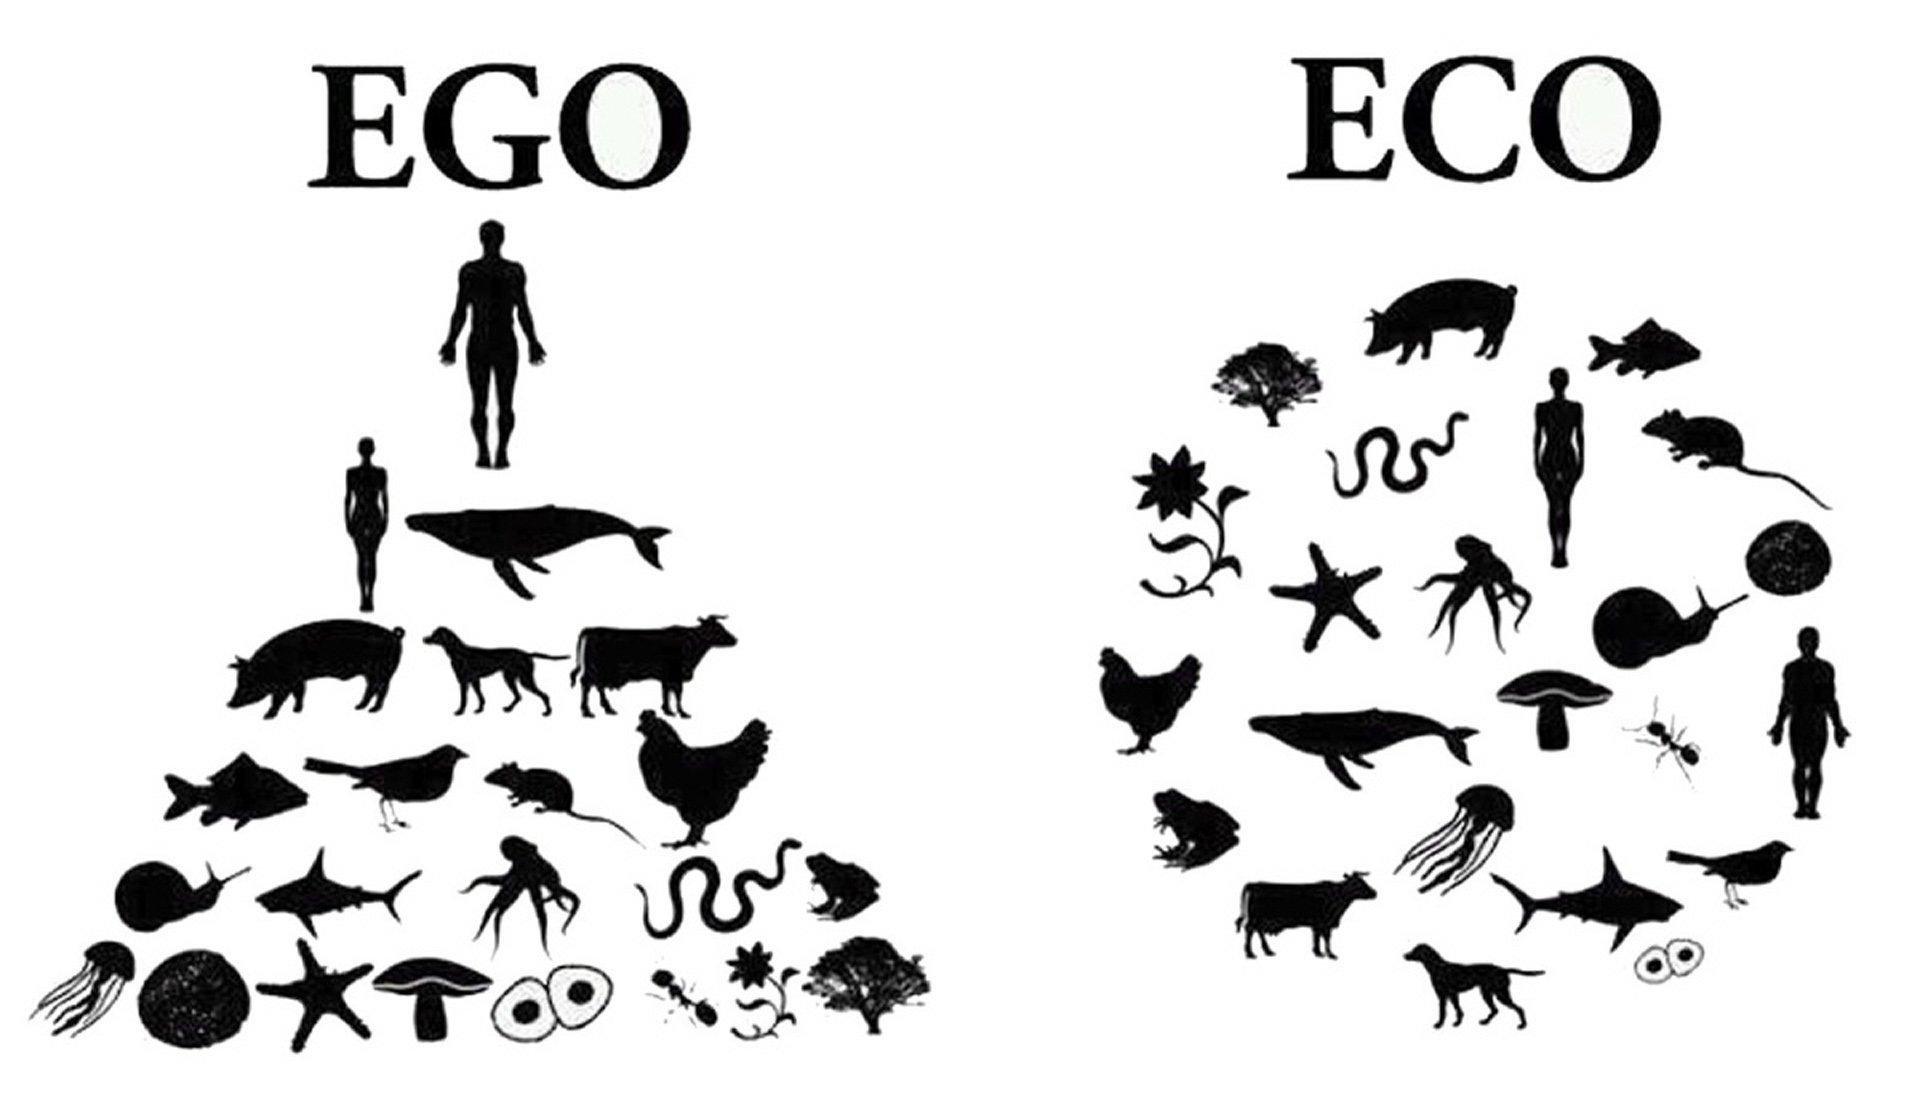 Eco -Ego schema